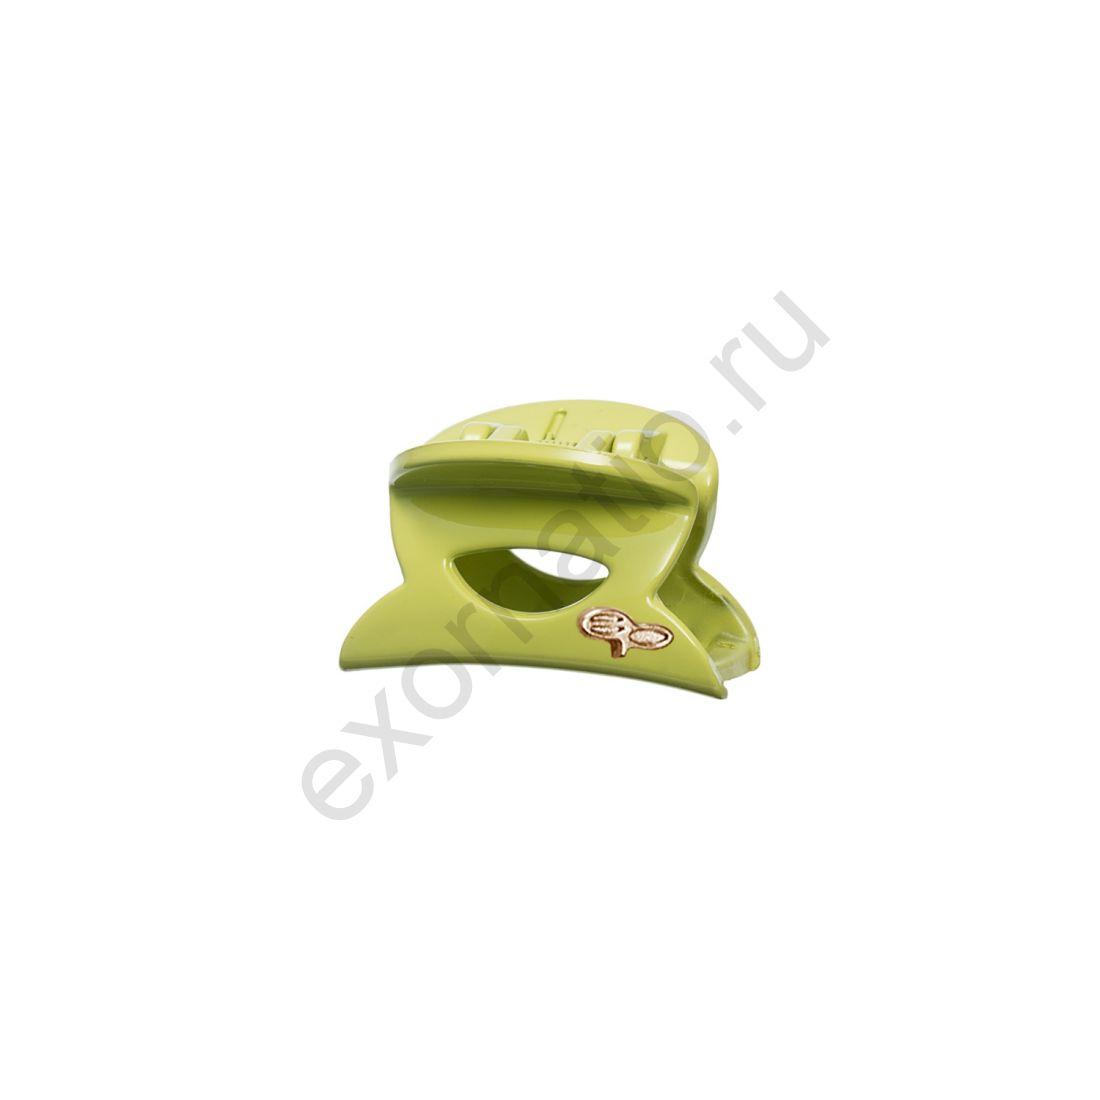 Заколка-краб Evita Peroni 4176121. Коллекция Aimi mini Lime